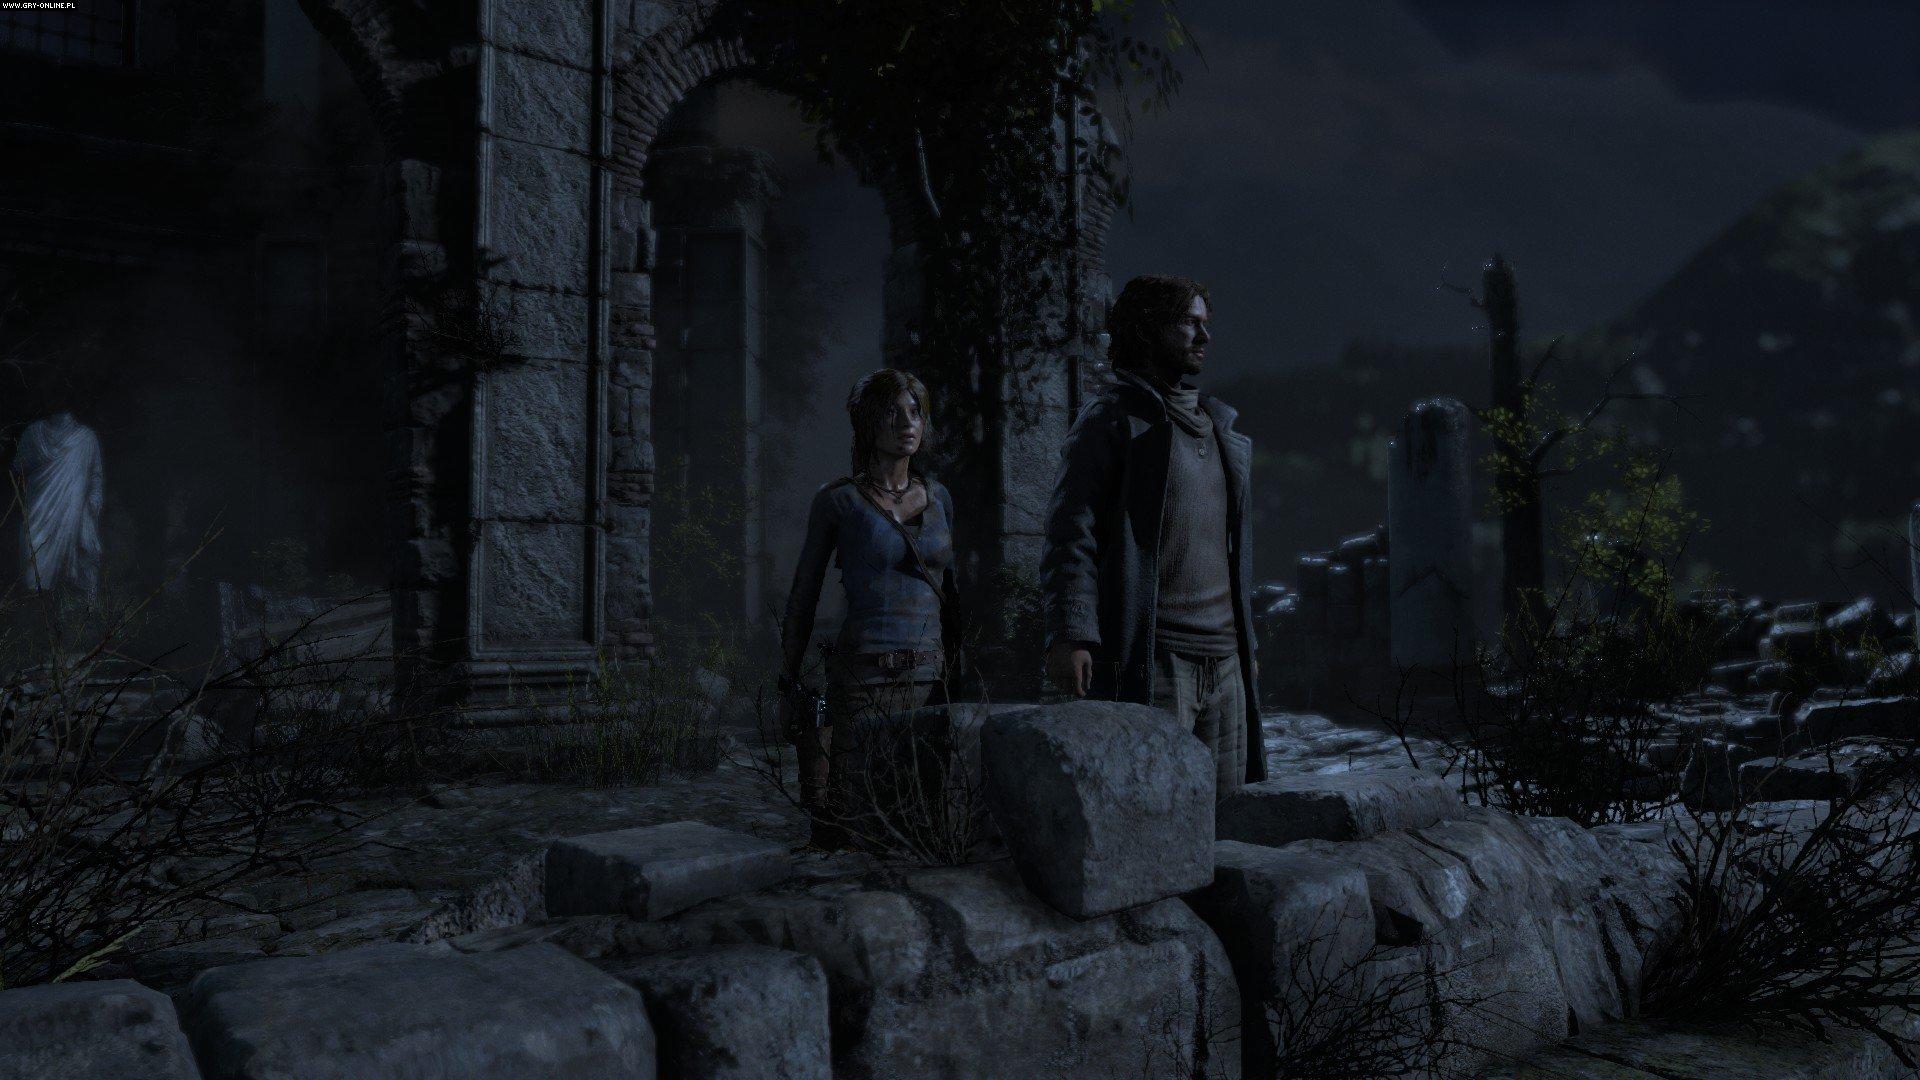 Rise of the Tomb Raider PC, XONE Games Image 41/126, Crystal Dynamics, Square-Enix / Eidos